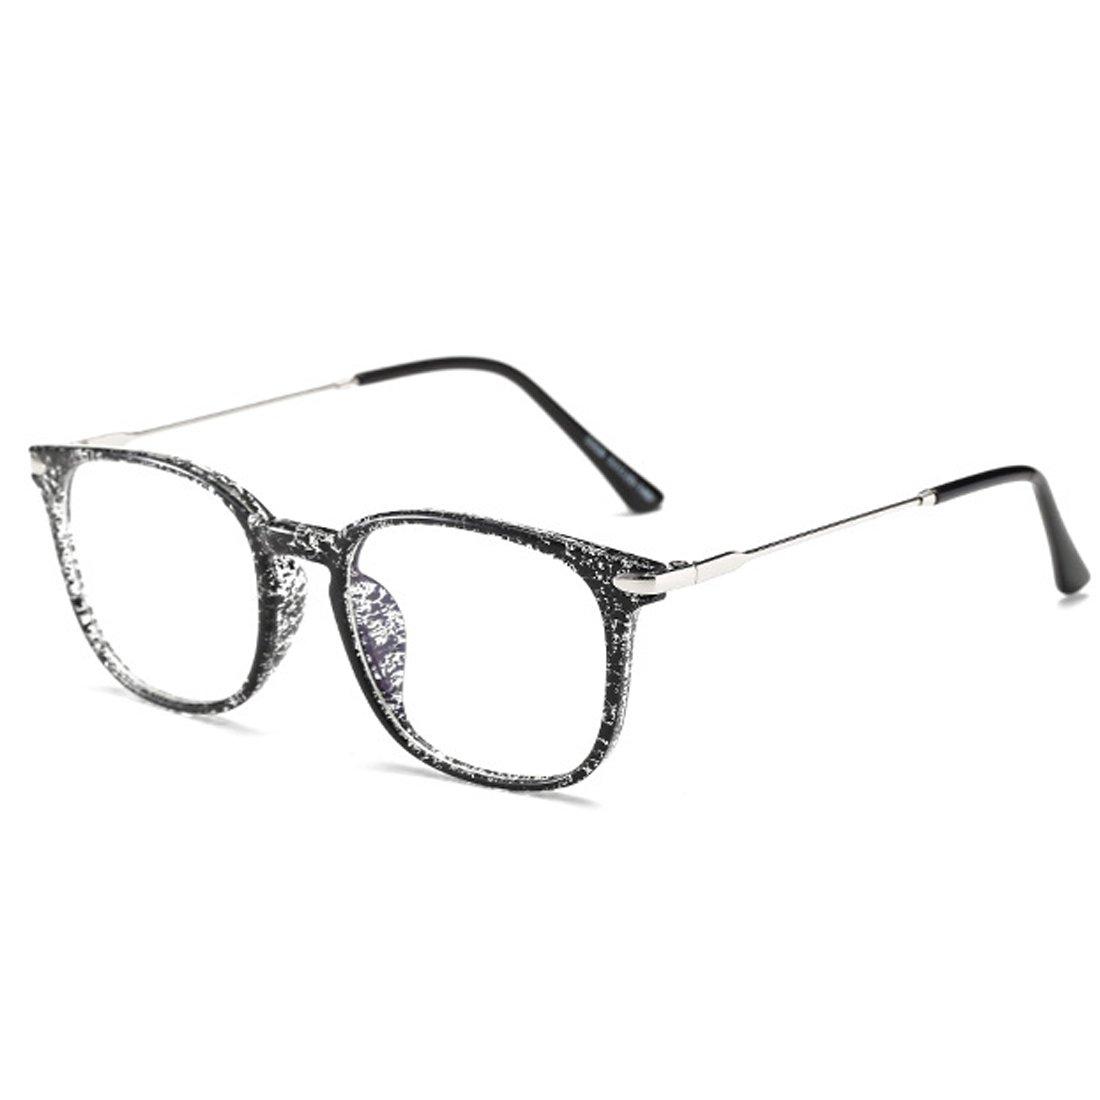 Rnow Vintage Anti-Reflective Anti-Glare Anti-Blue Rays Sunglasses Clear Lens Computer Gaming Eyeglasses